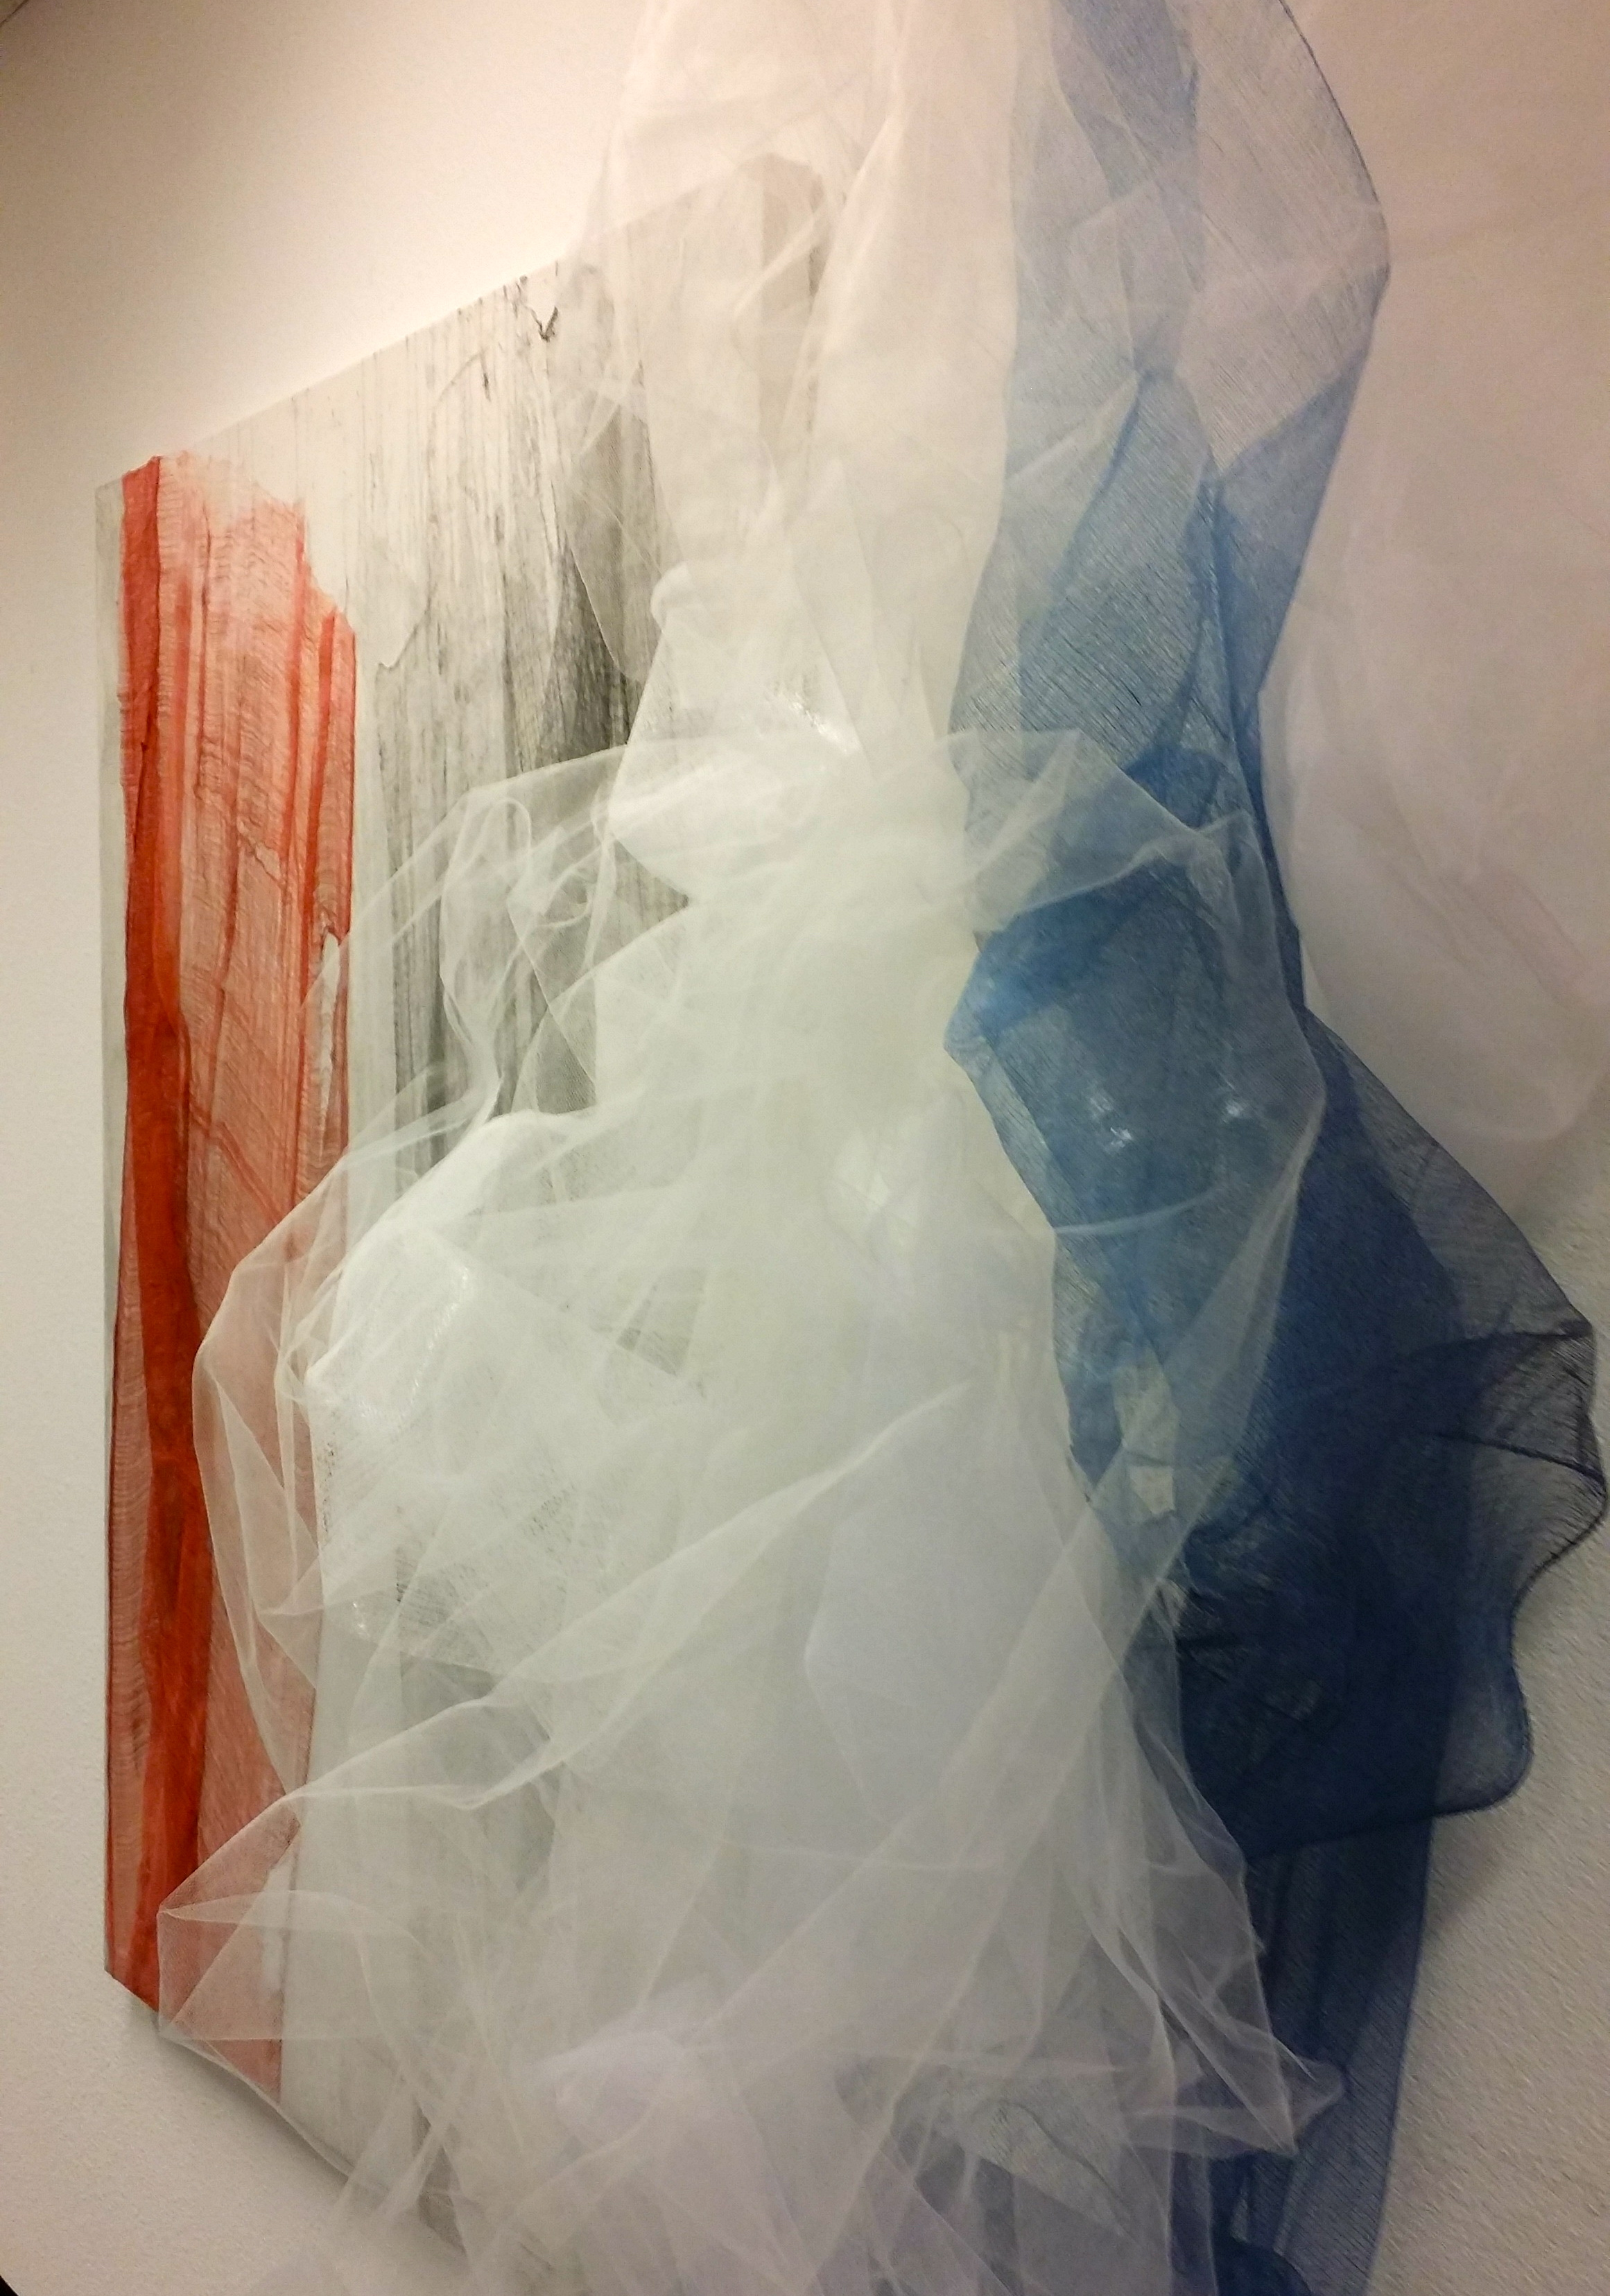 Weightlessness Studio Installation, 2015, 24 x 24 x 108 inches